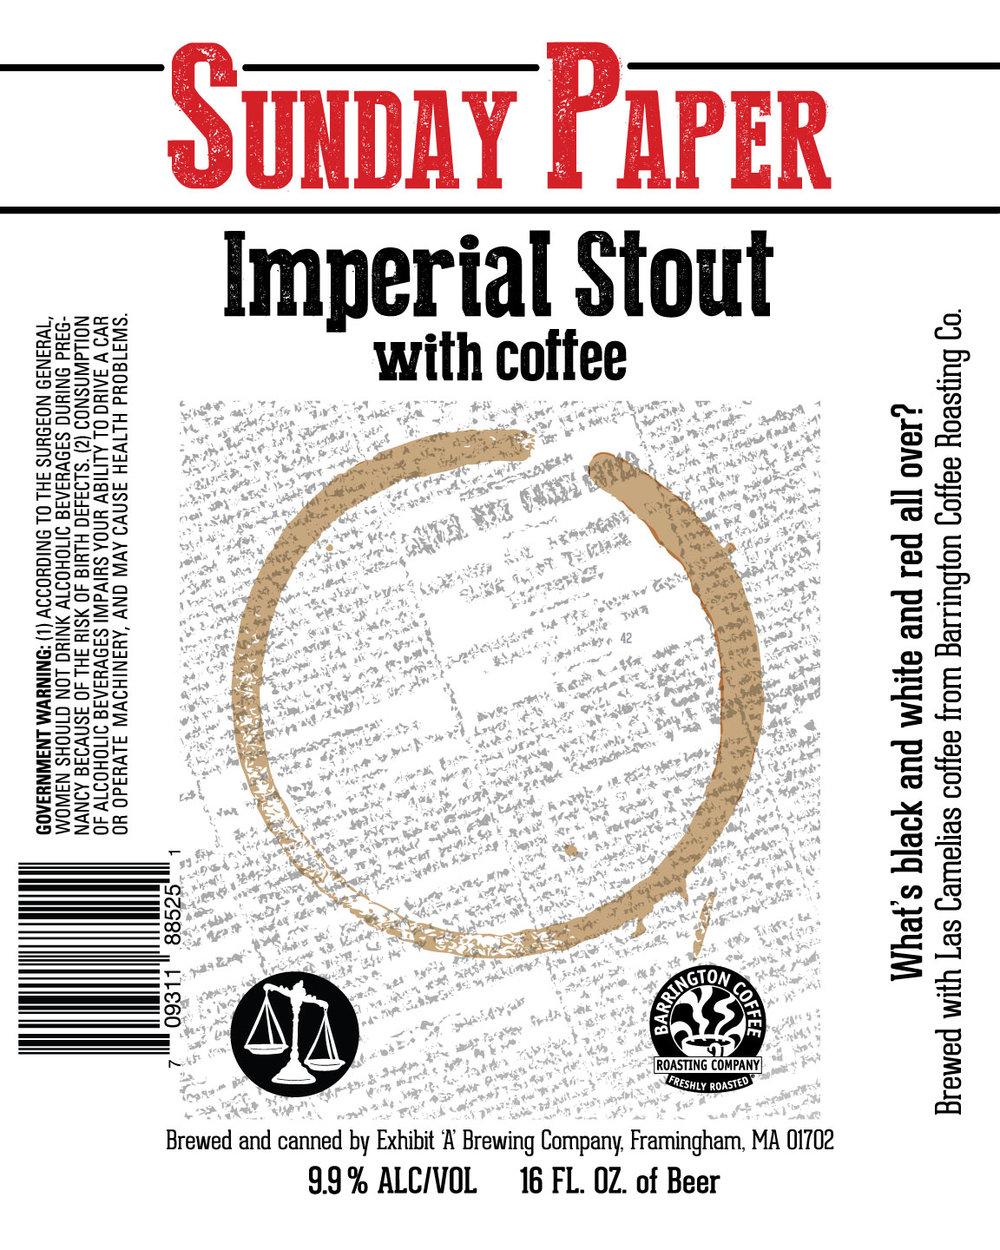 SundayPaper-Label-Final.jpg